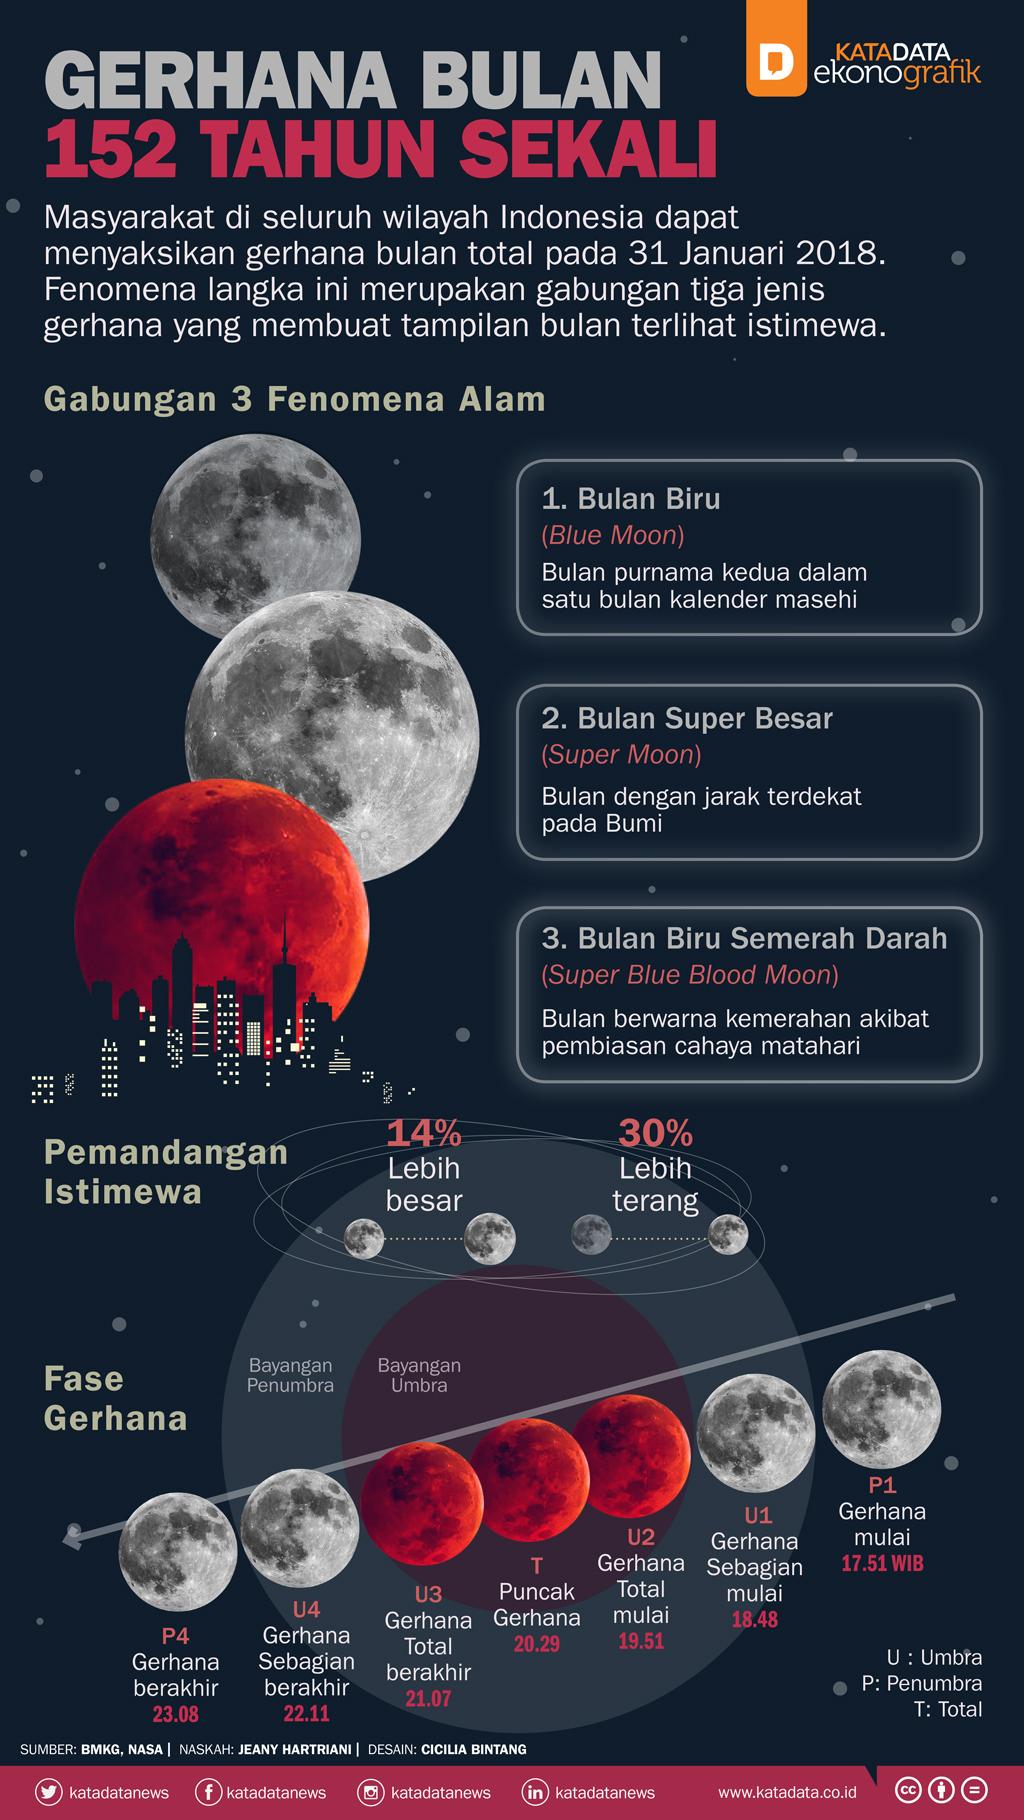 Gerhana Bulan 152 Tahun Sekali_rev